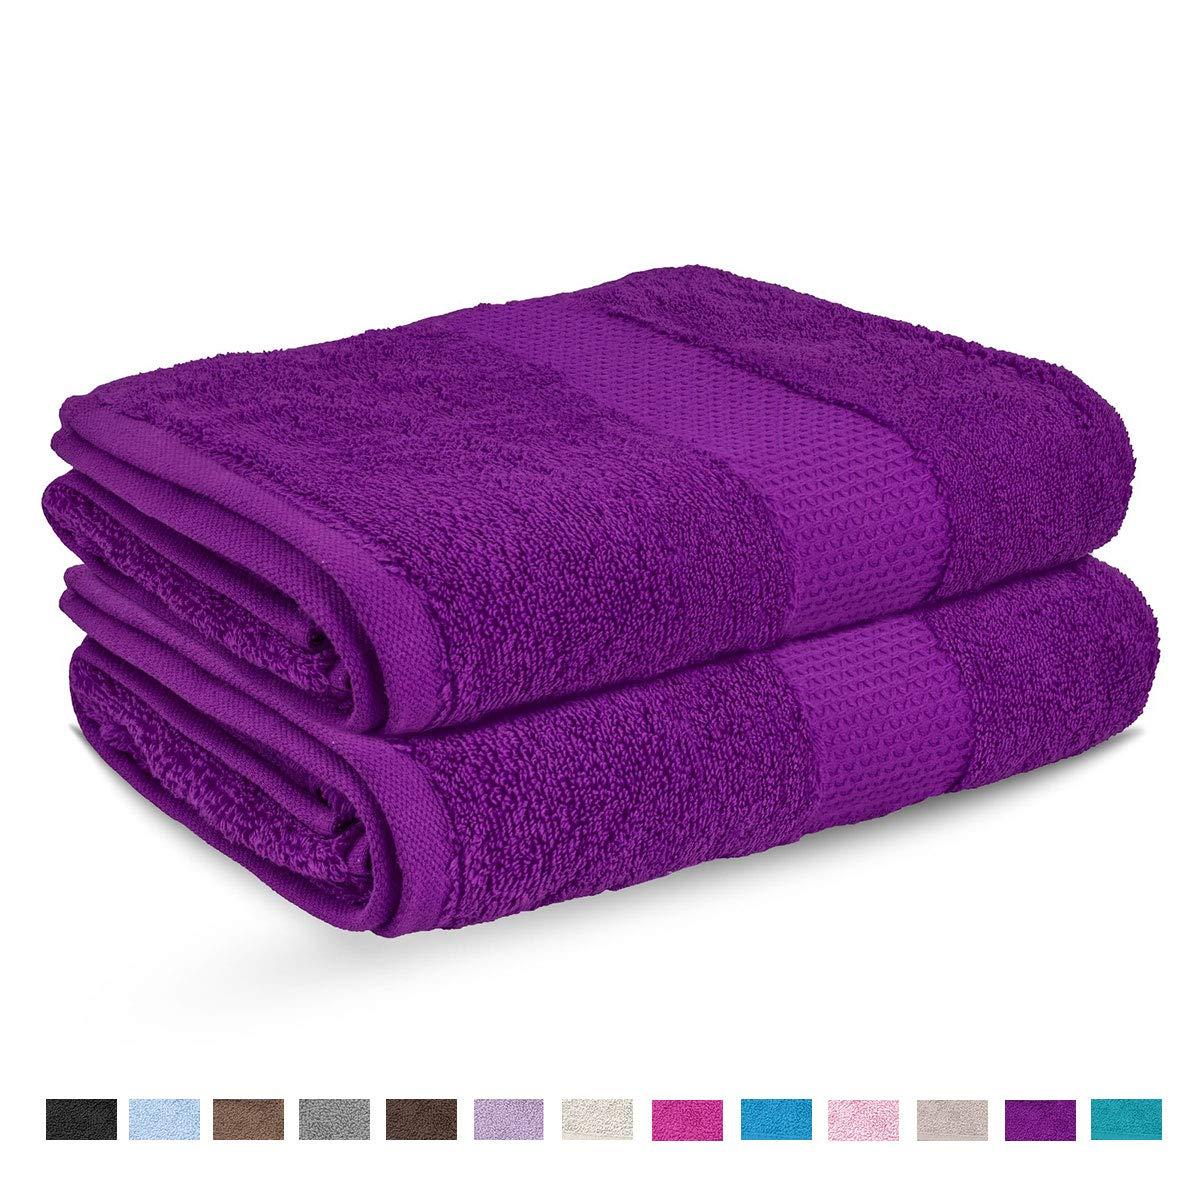 Lions Toallas de baño Miami, Toalla de Mano Gigante, 100% algodón, con Agua borbada, gsm 700, Morado, 2X Bath Towel: Amazon.es: Hogar